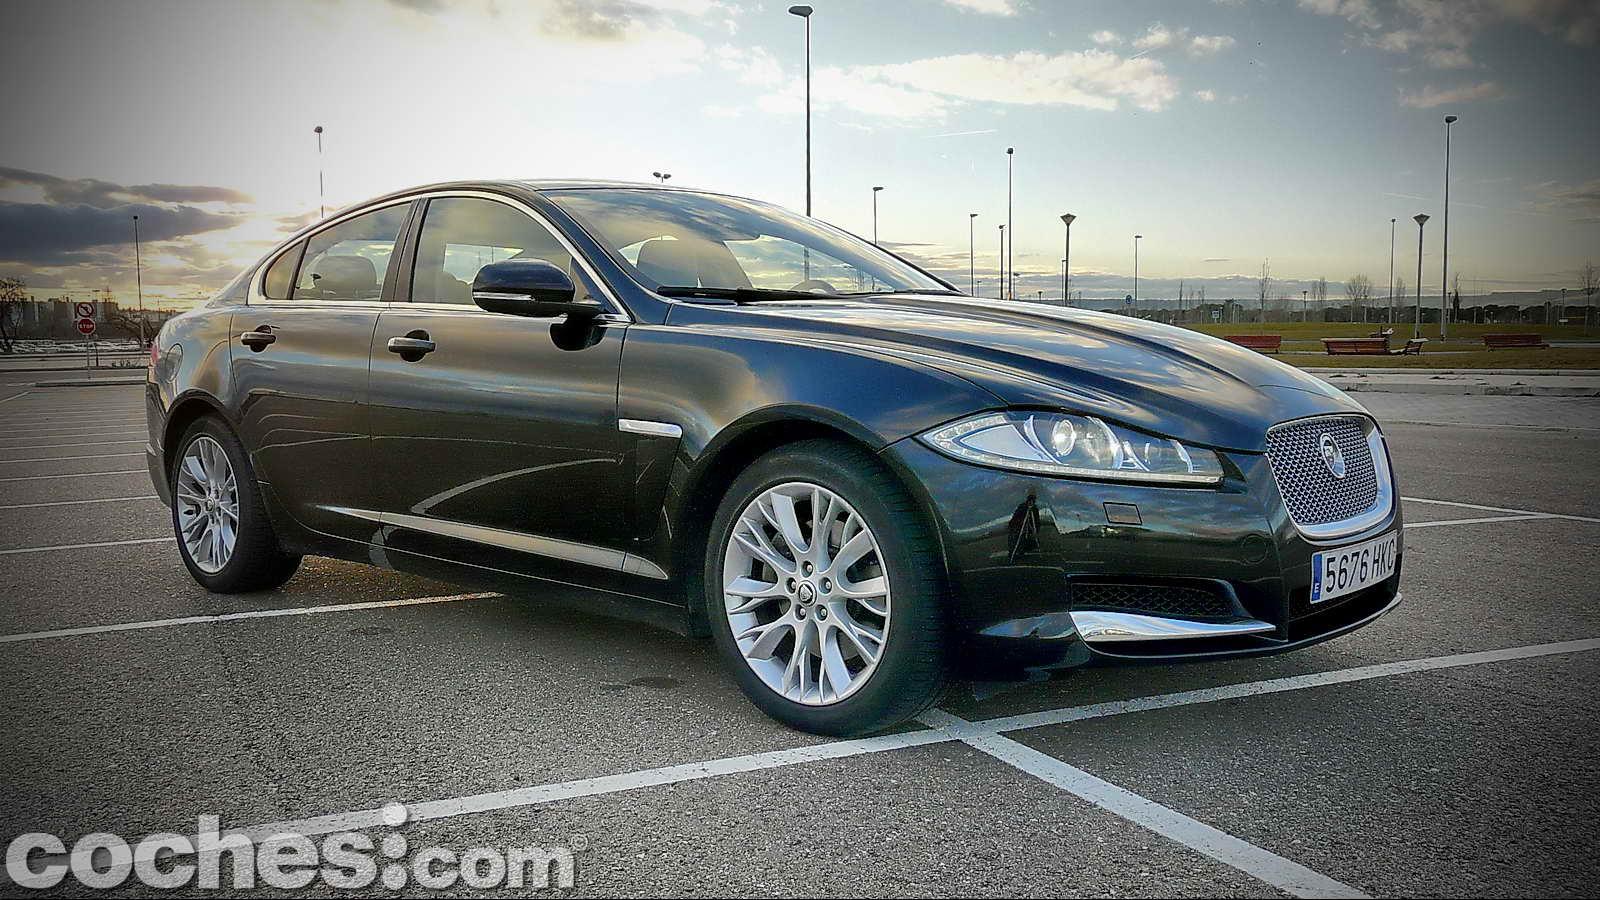 Diesel Premium Luxury 32 650x365 Prueba a fondo: Jaguar XF 3.0 V6 ...